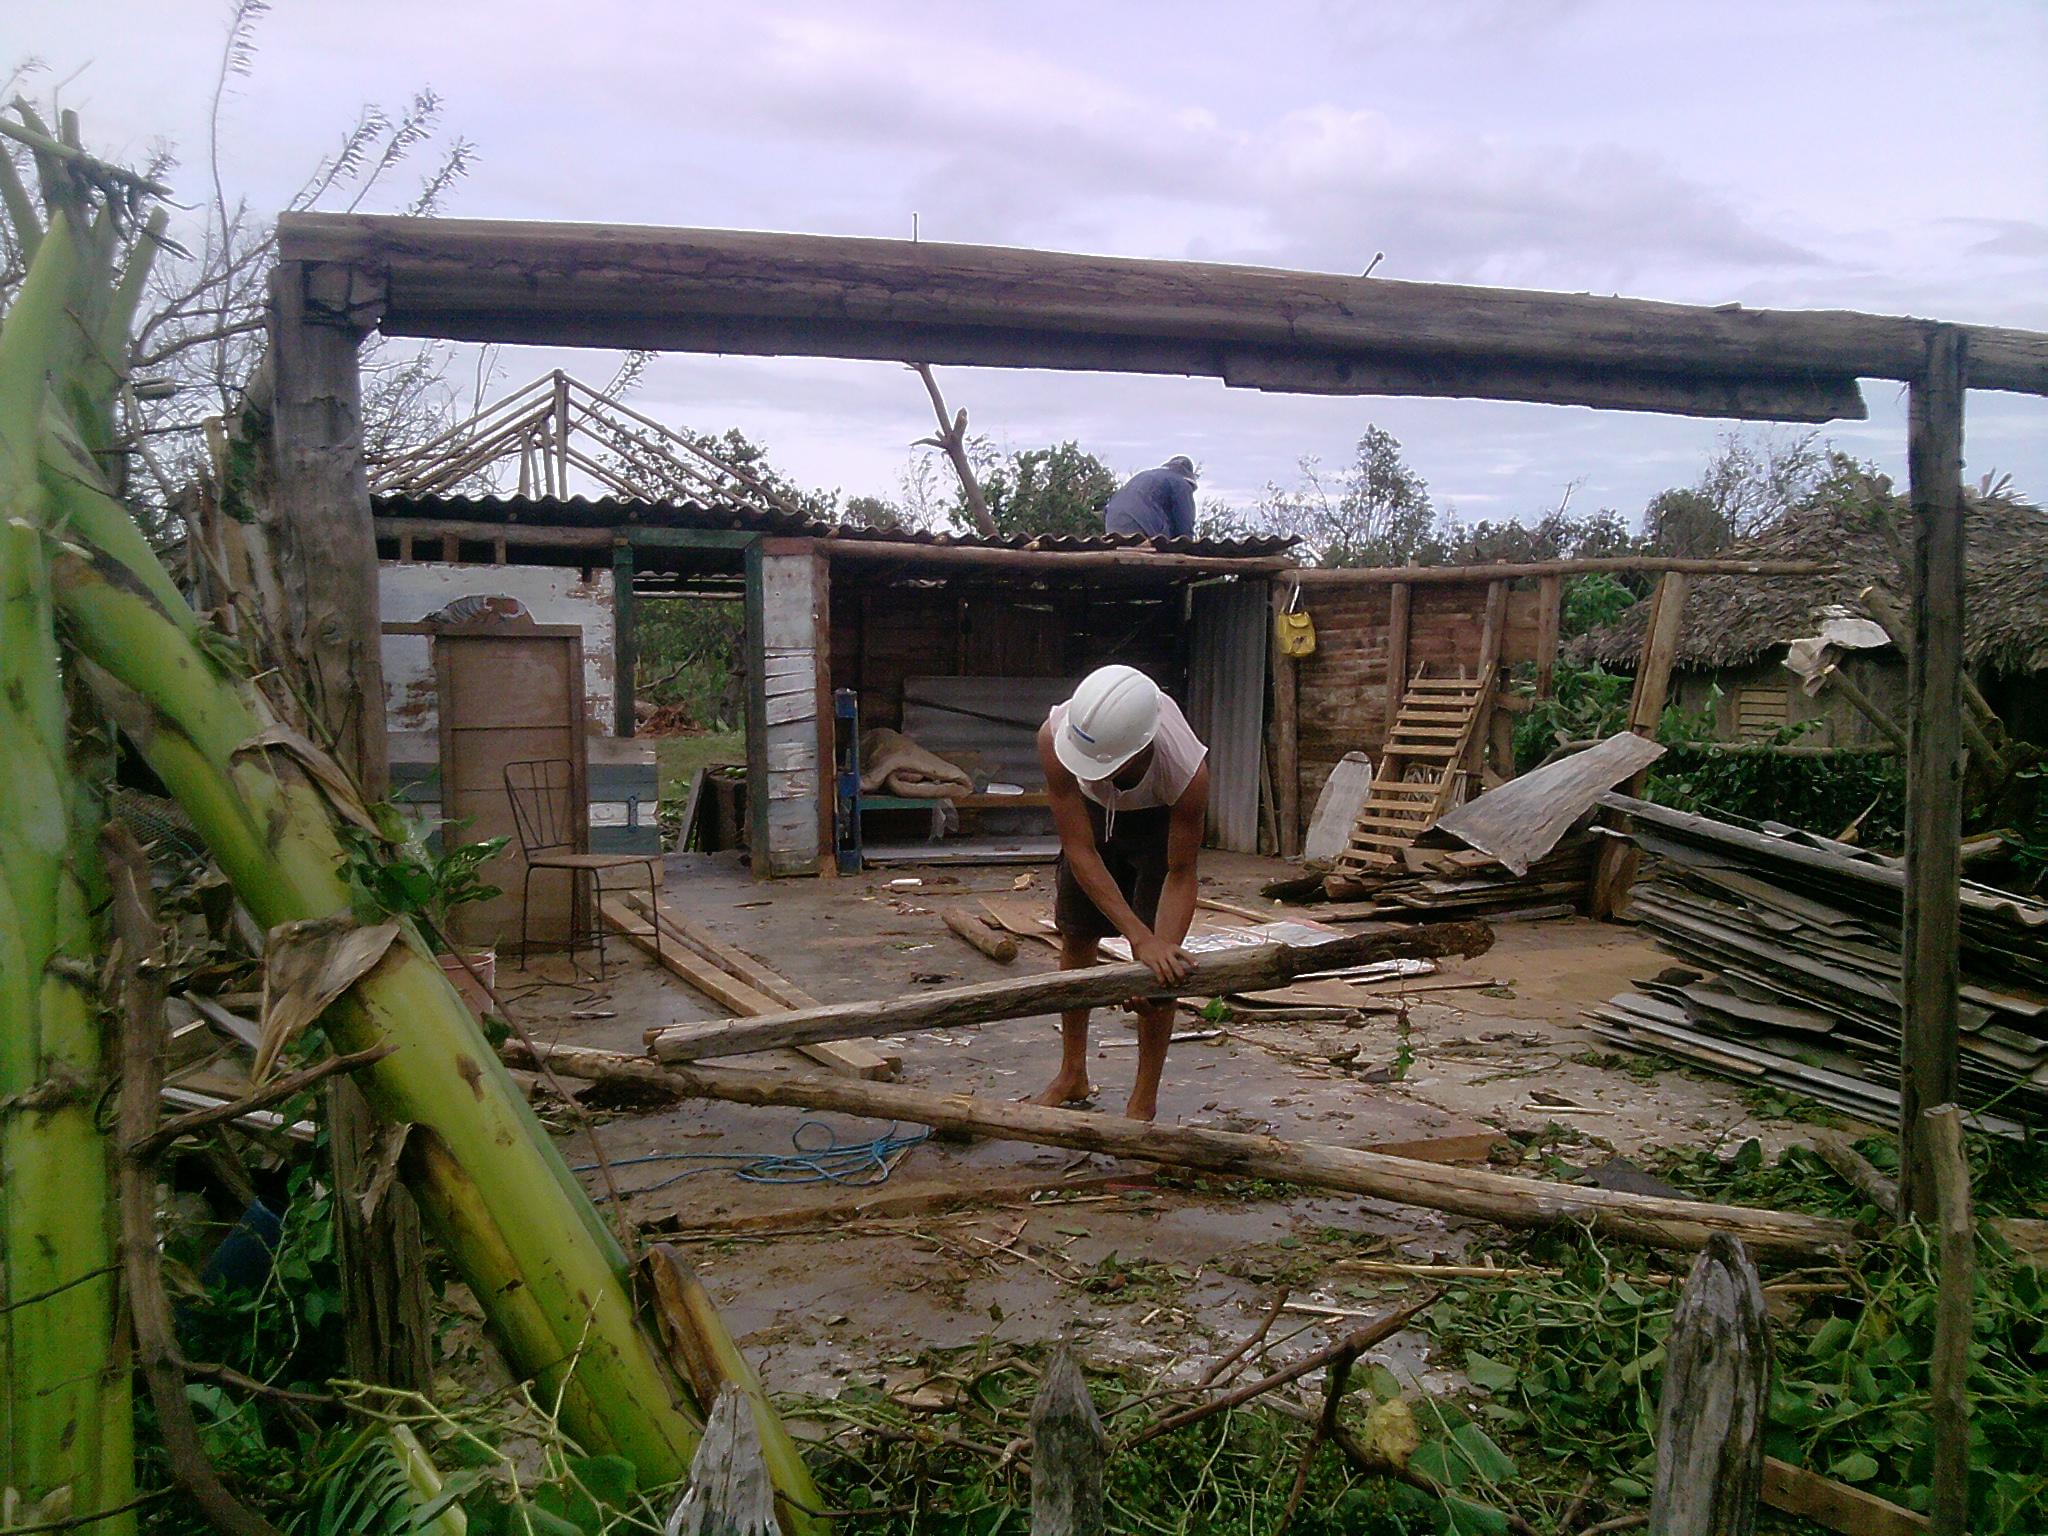 The home of Yoandris Ramírez in El Ramón, Holguín Province, was destroyed by Hurricane Sandy.